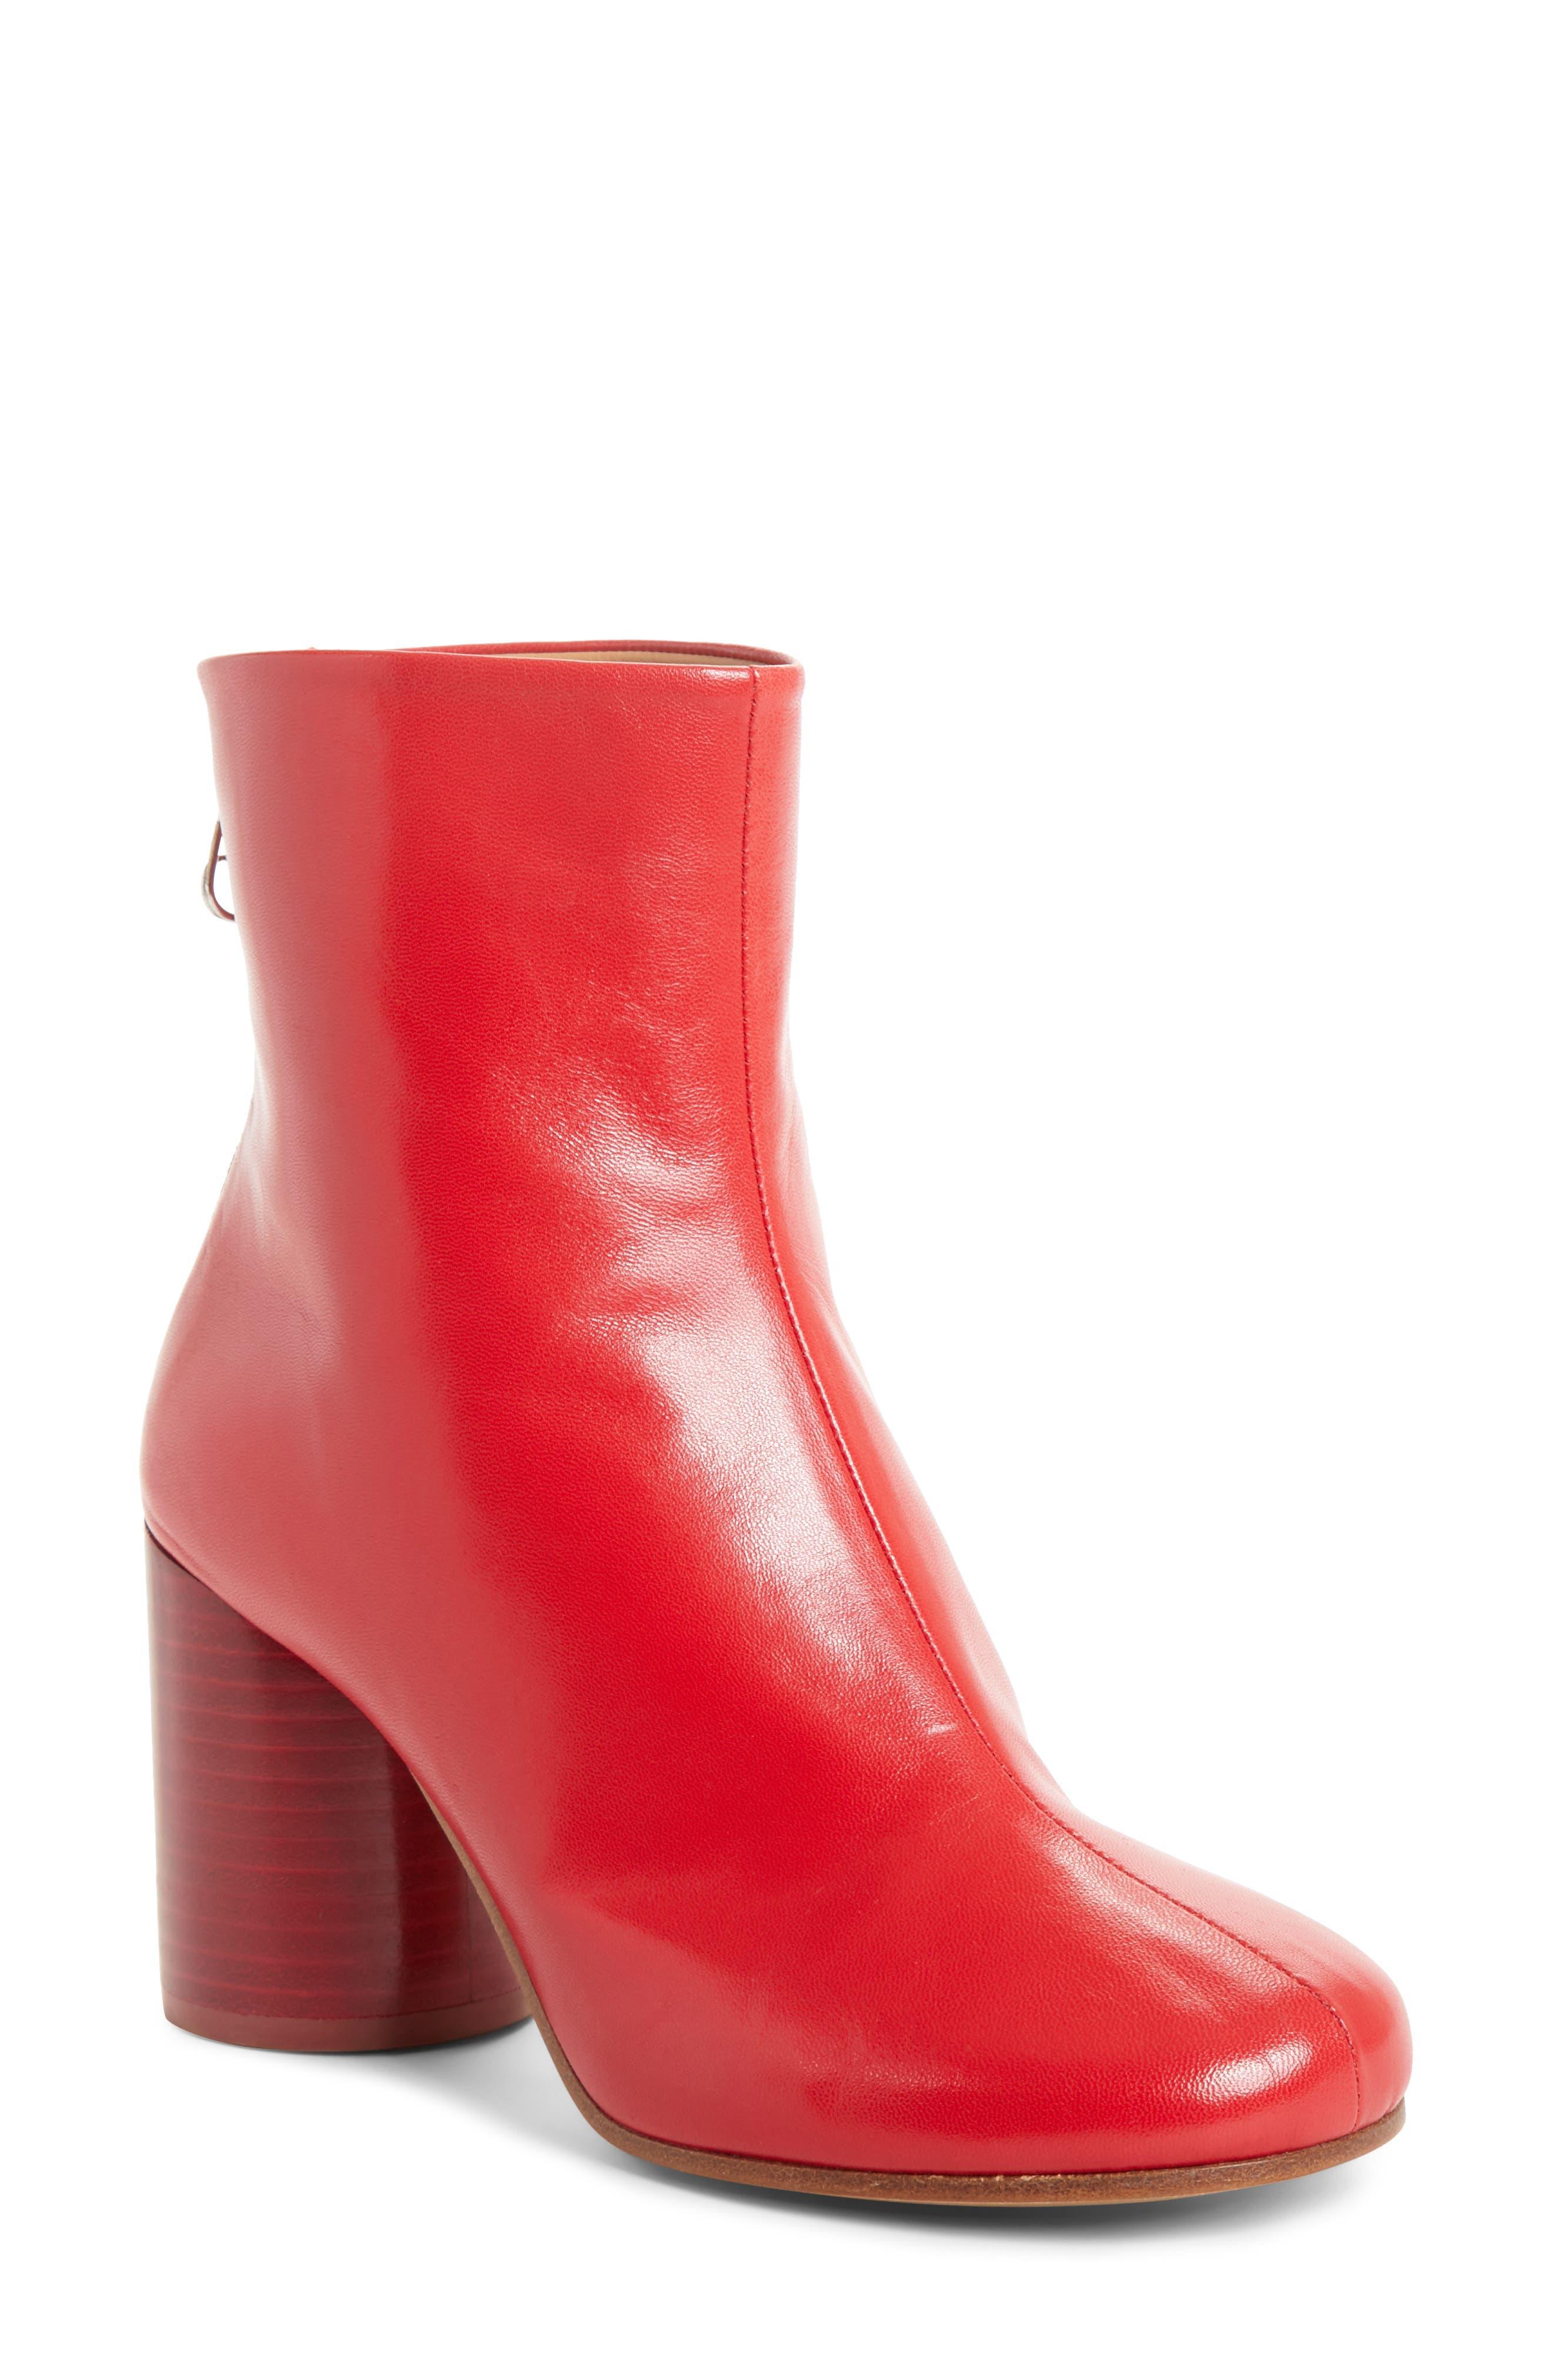 Alternate Image 1 Selected - Maison Margiela Round Heel Ankle Boot (Women)